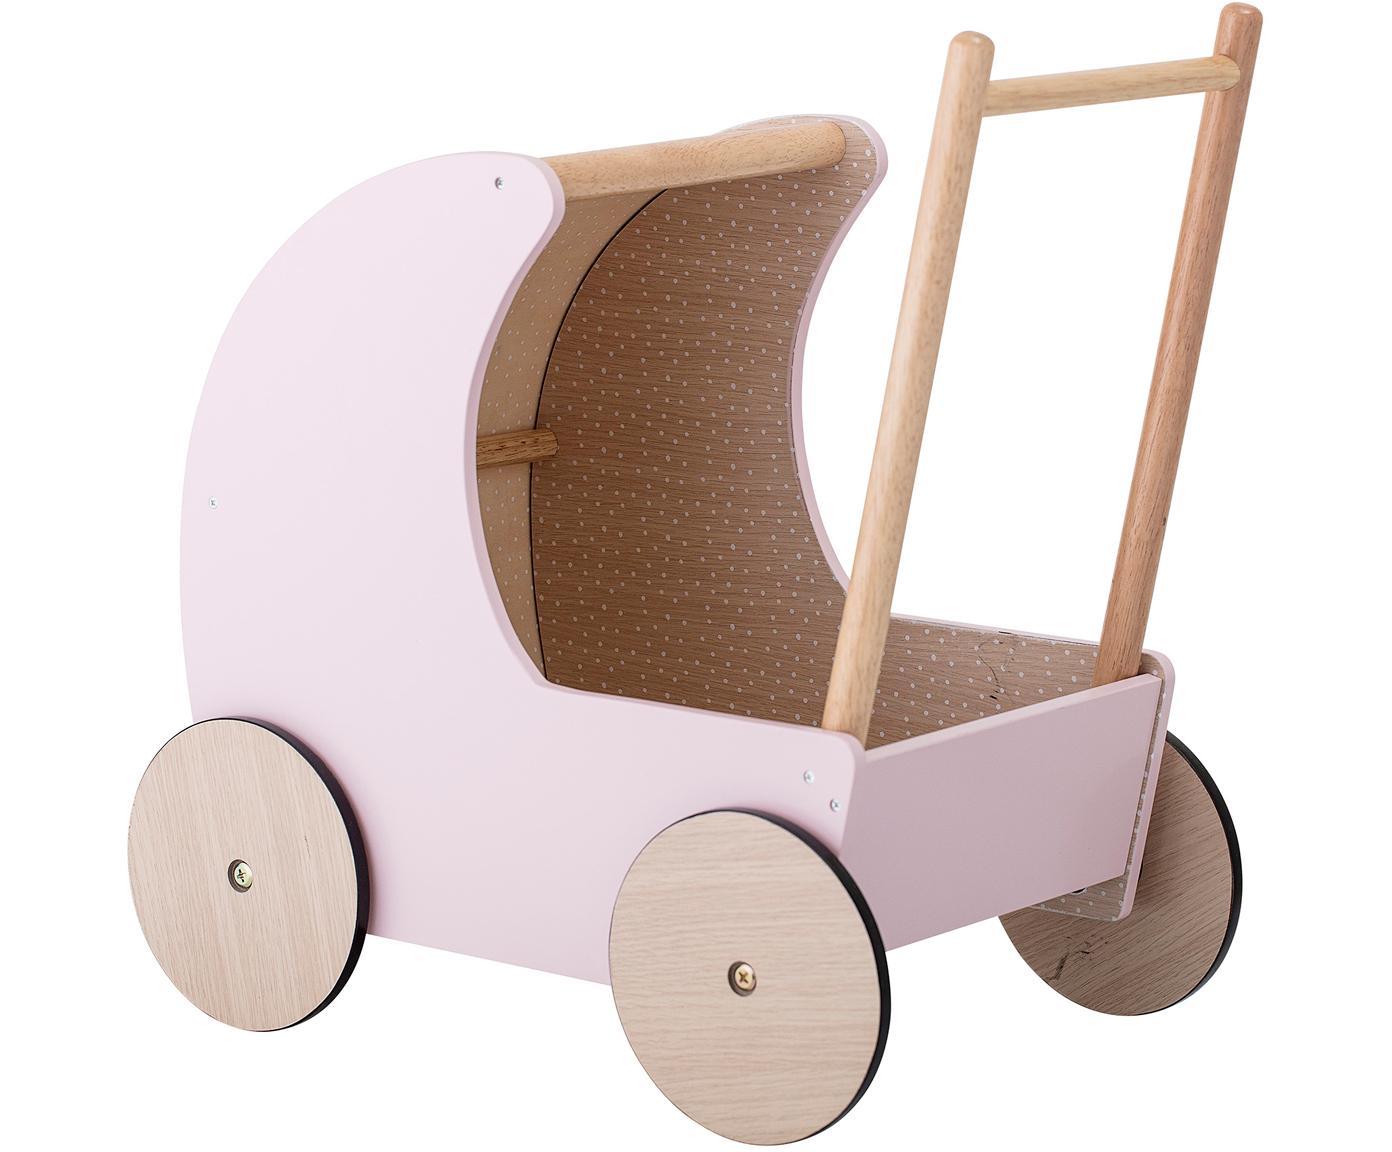 Carrito para muñecas Walk, Tablero de fibras de densidad media (MDF), madera de caucho, Rosa, An 25 x Al 40 cm